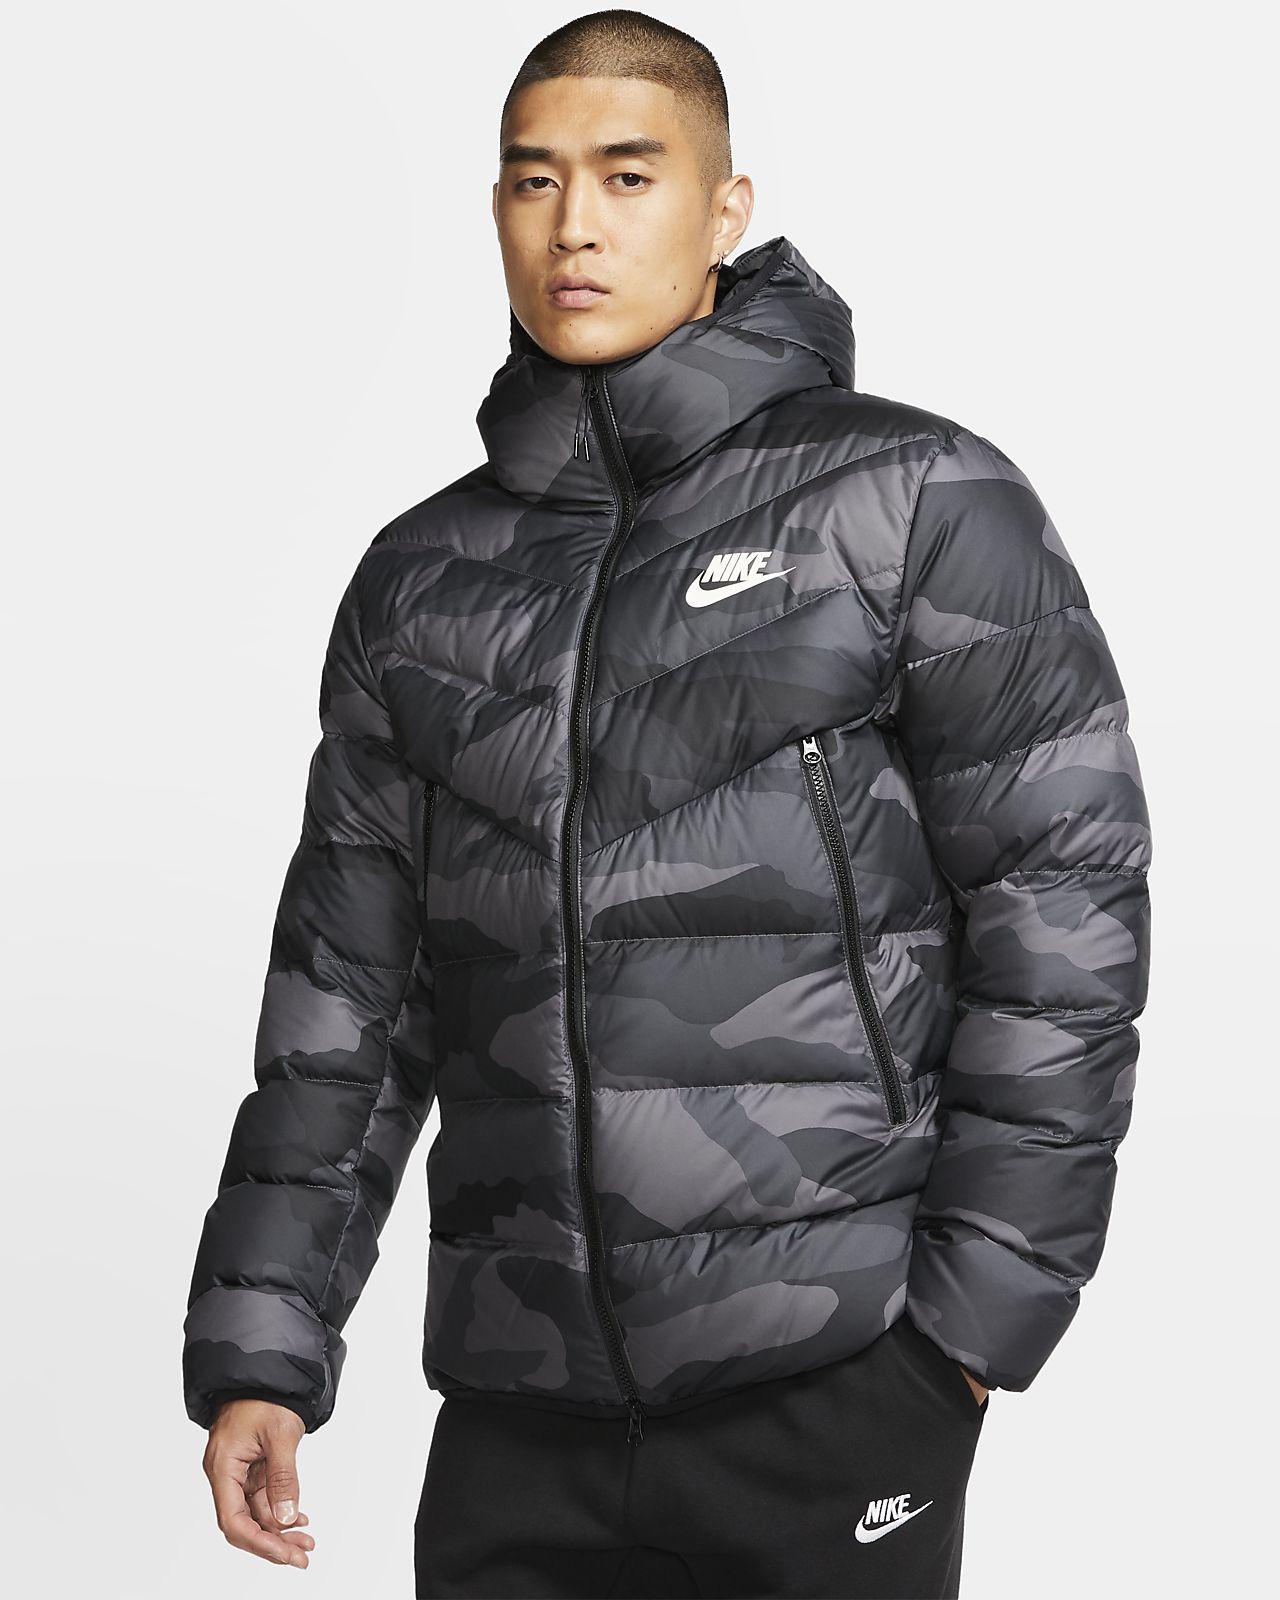 Chamarra con capucha estampada Nike Sportswear Windrunner con relleno de plumón